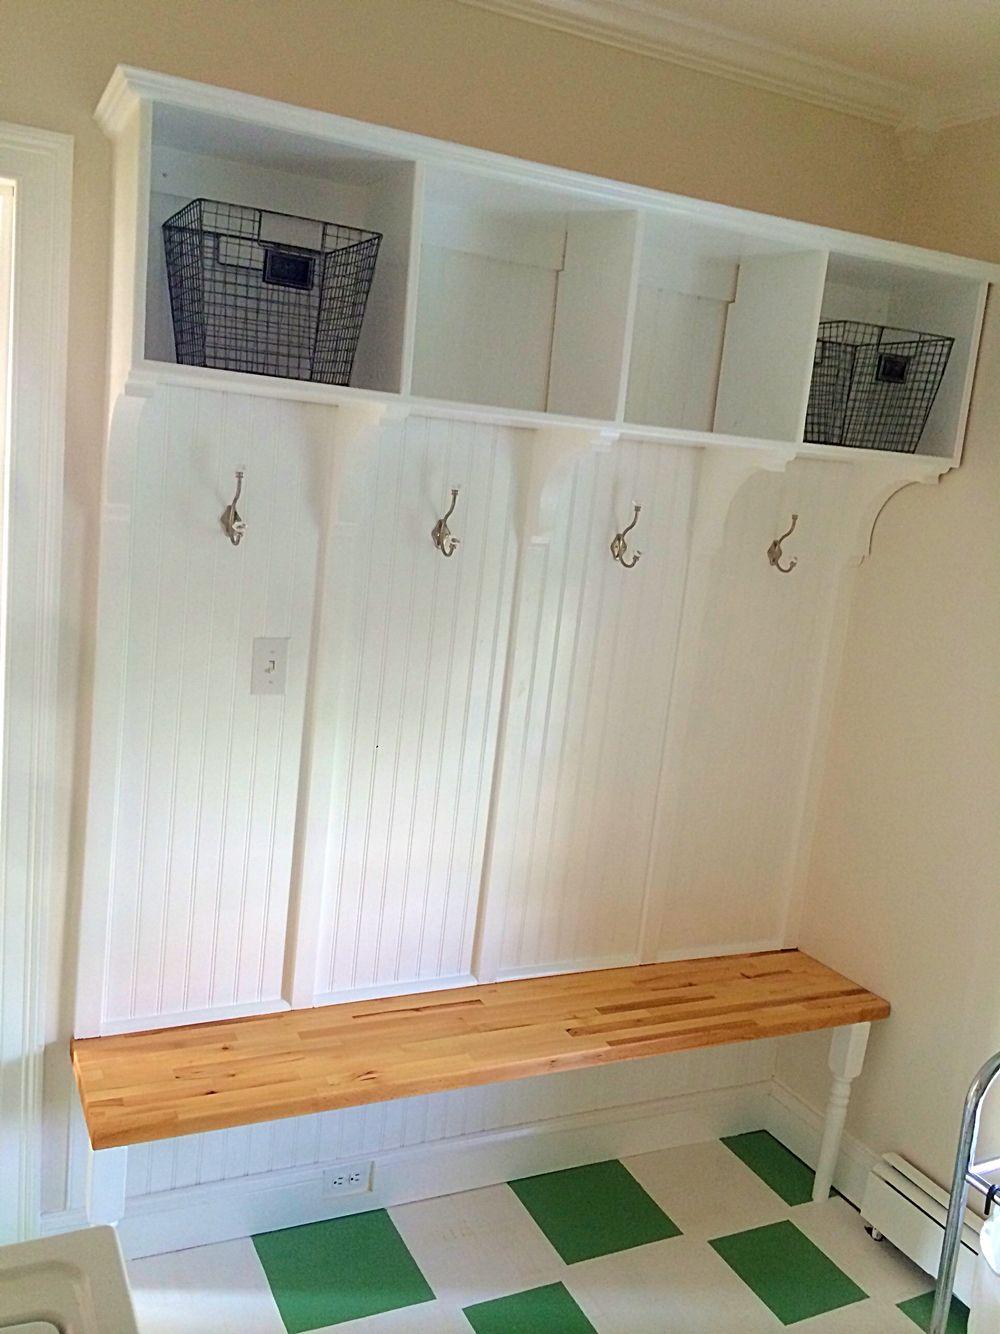 Laundry Room Mud Room With Handmade Bead Board Coat Rack Oak Butcher Block Seat And Storage Shelf Beadboard Storage Shelves Bathroom Medicine Cabinet